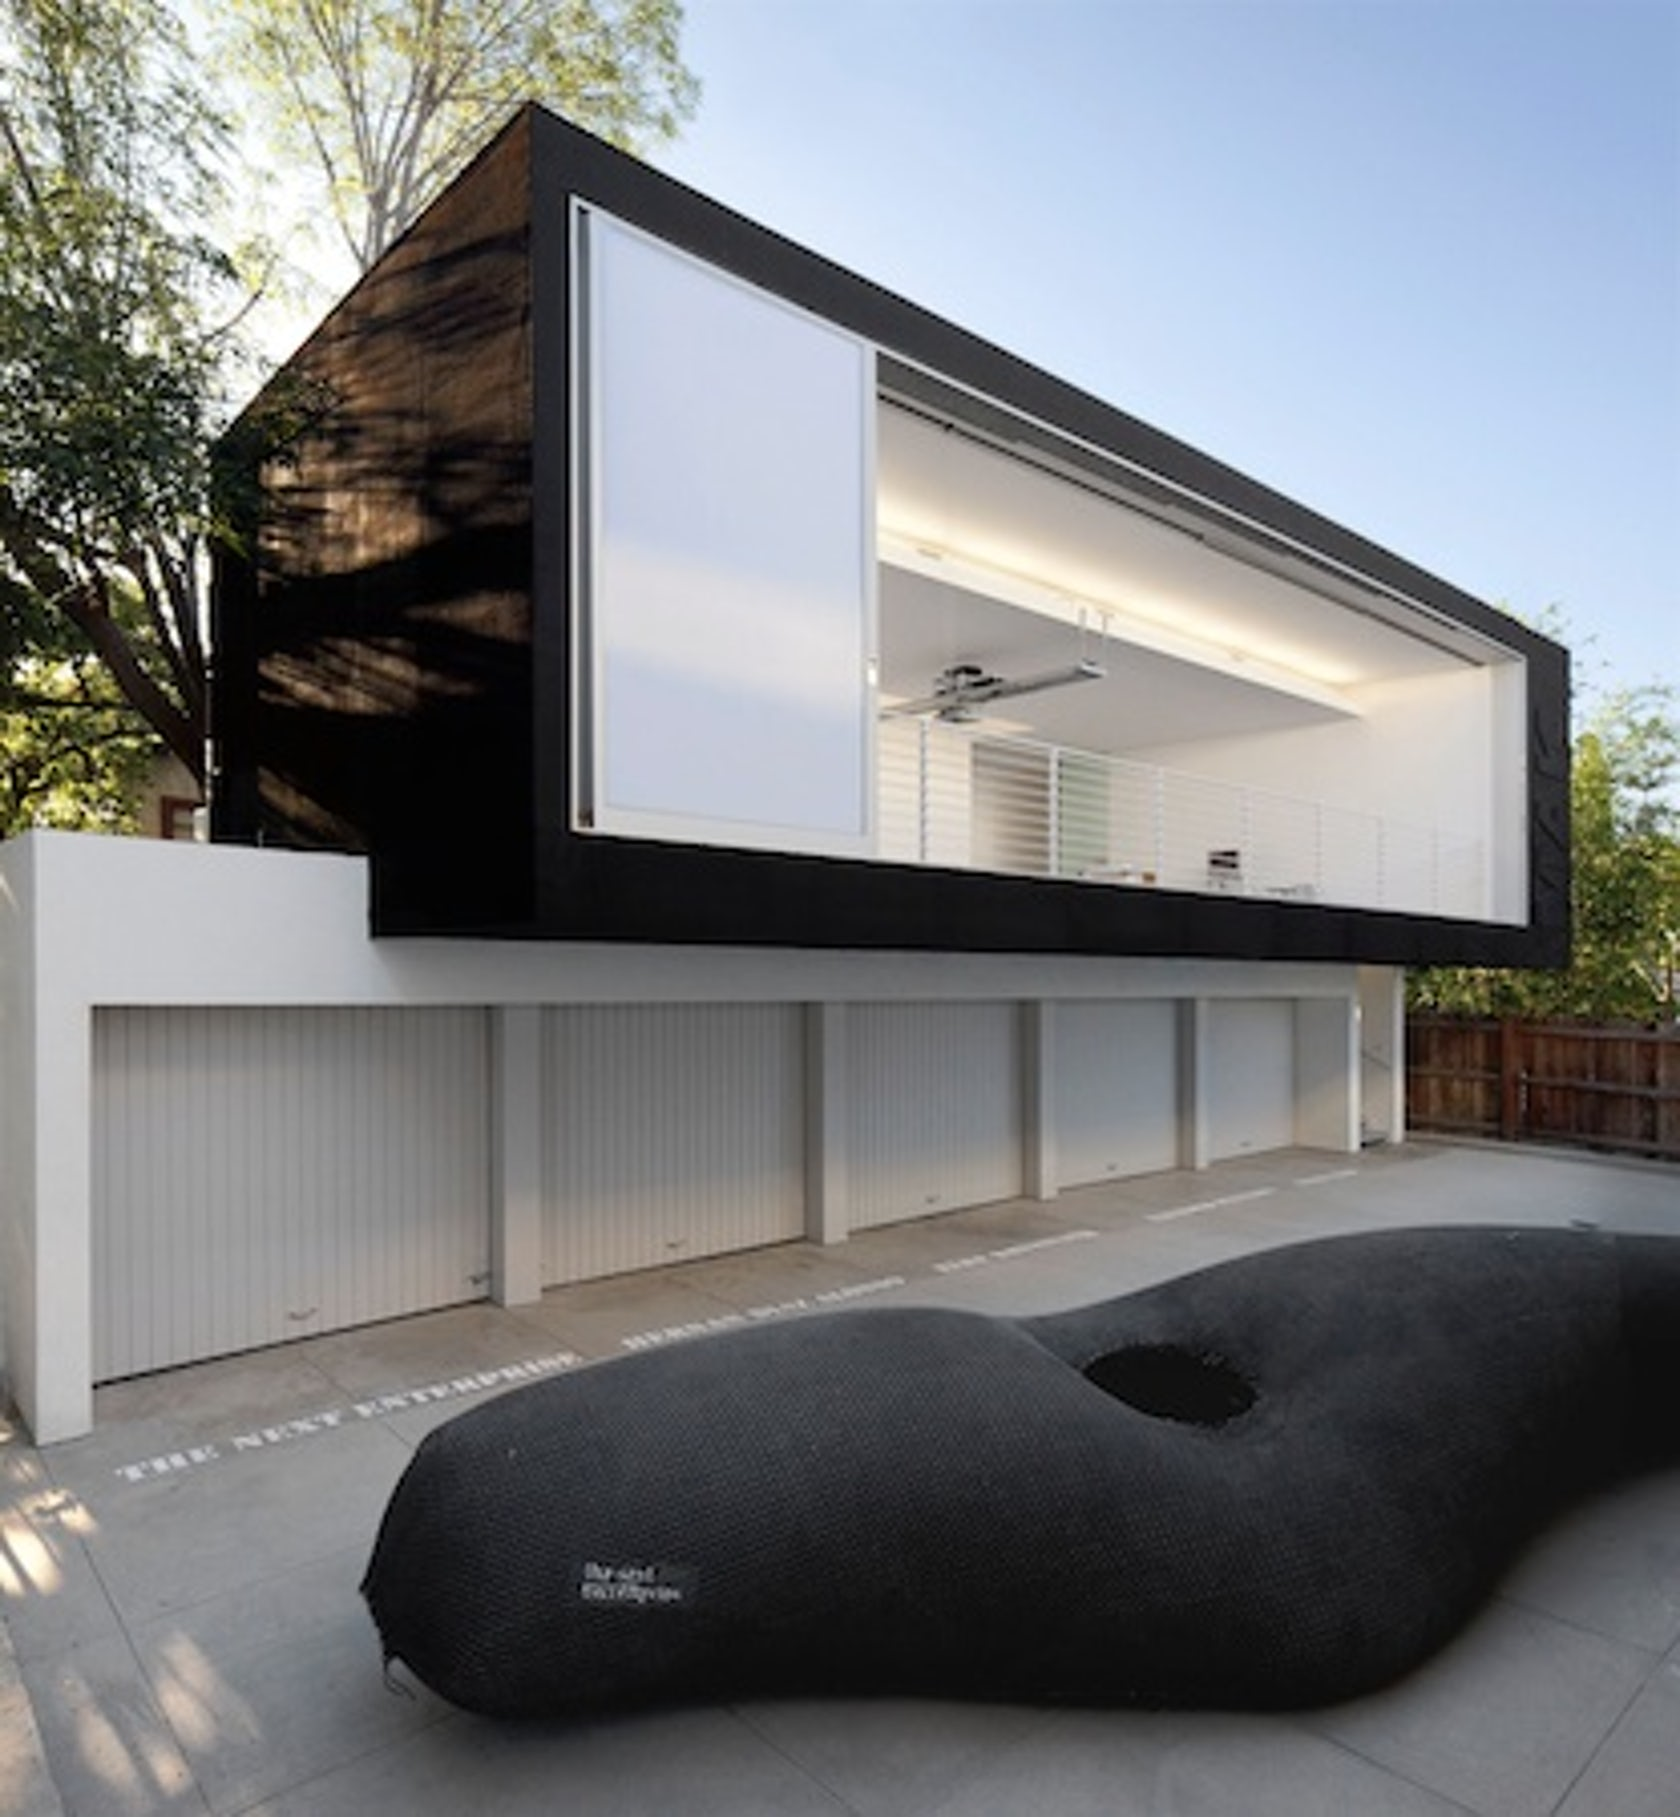 Mak gallery architizer for Arquitectura minimalista casas